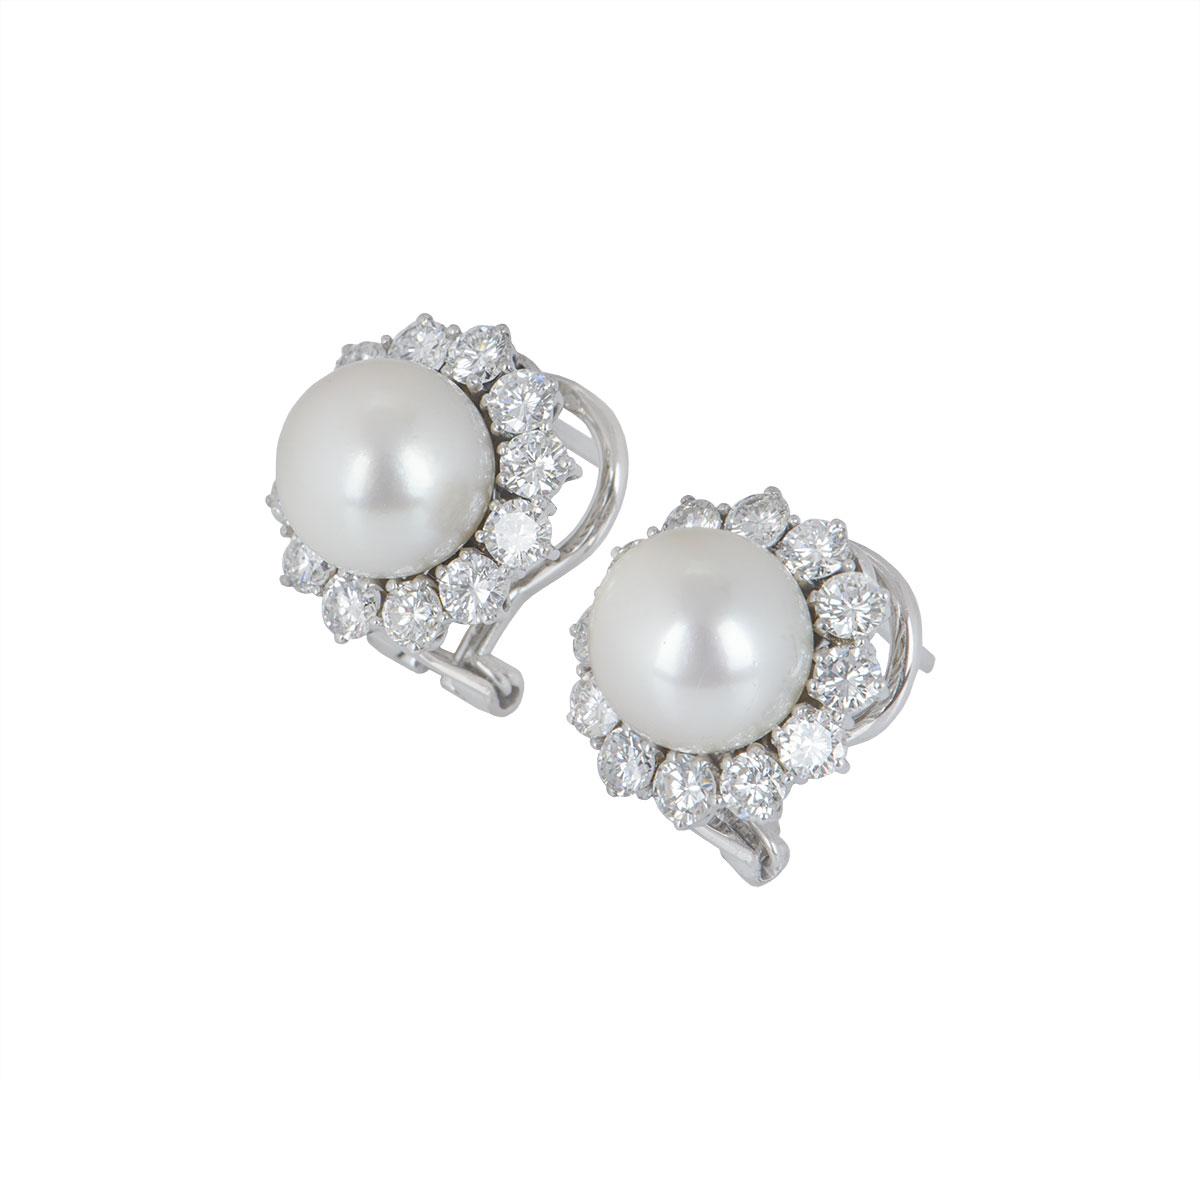 White Gold Diamond & Pearl Earrings